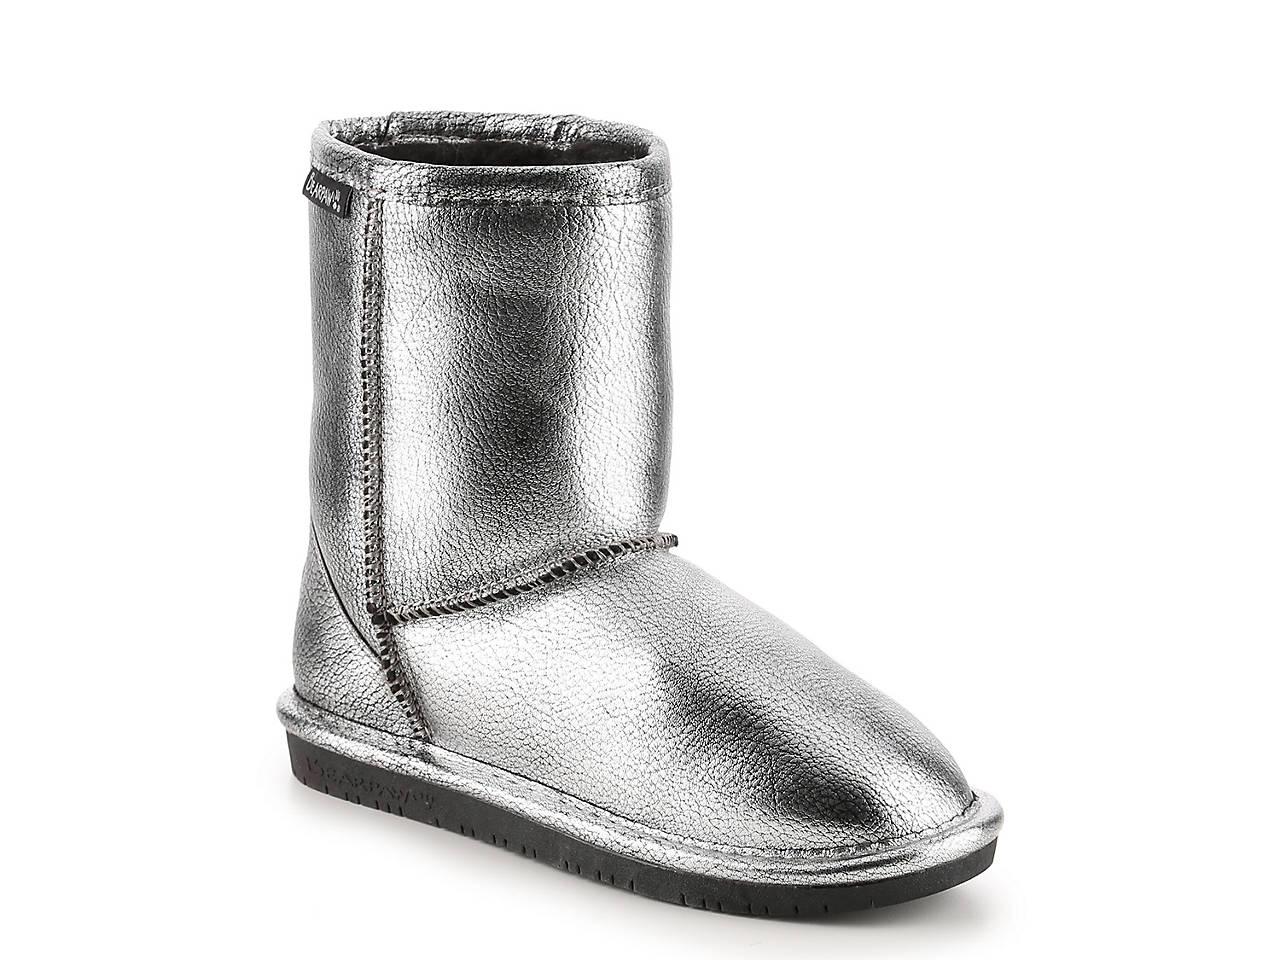 ea362ed917eff Bearpaw Emma Metallic Youth Boot Kids Shoes